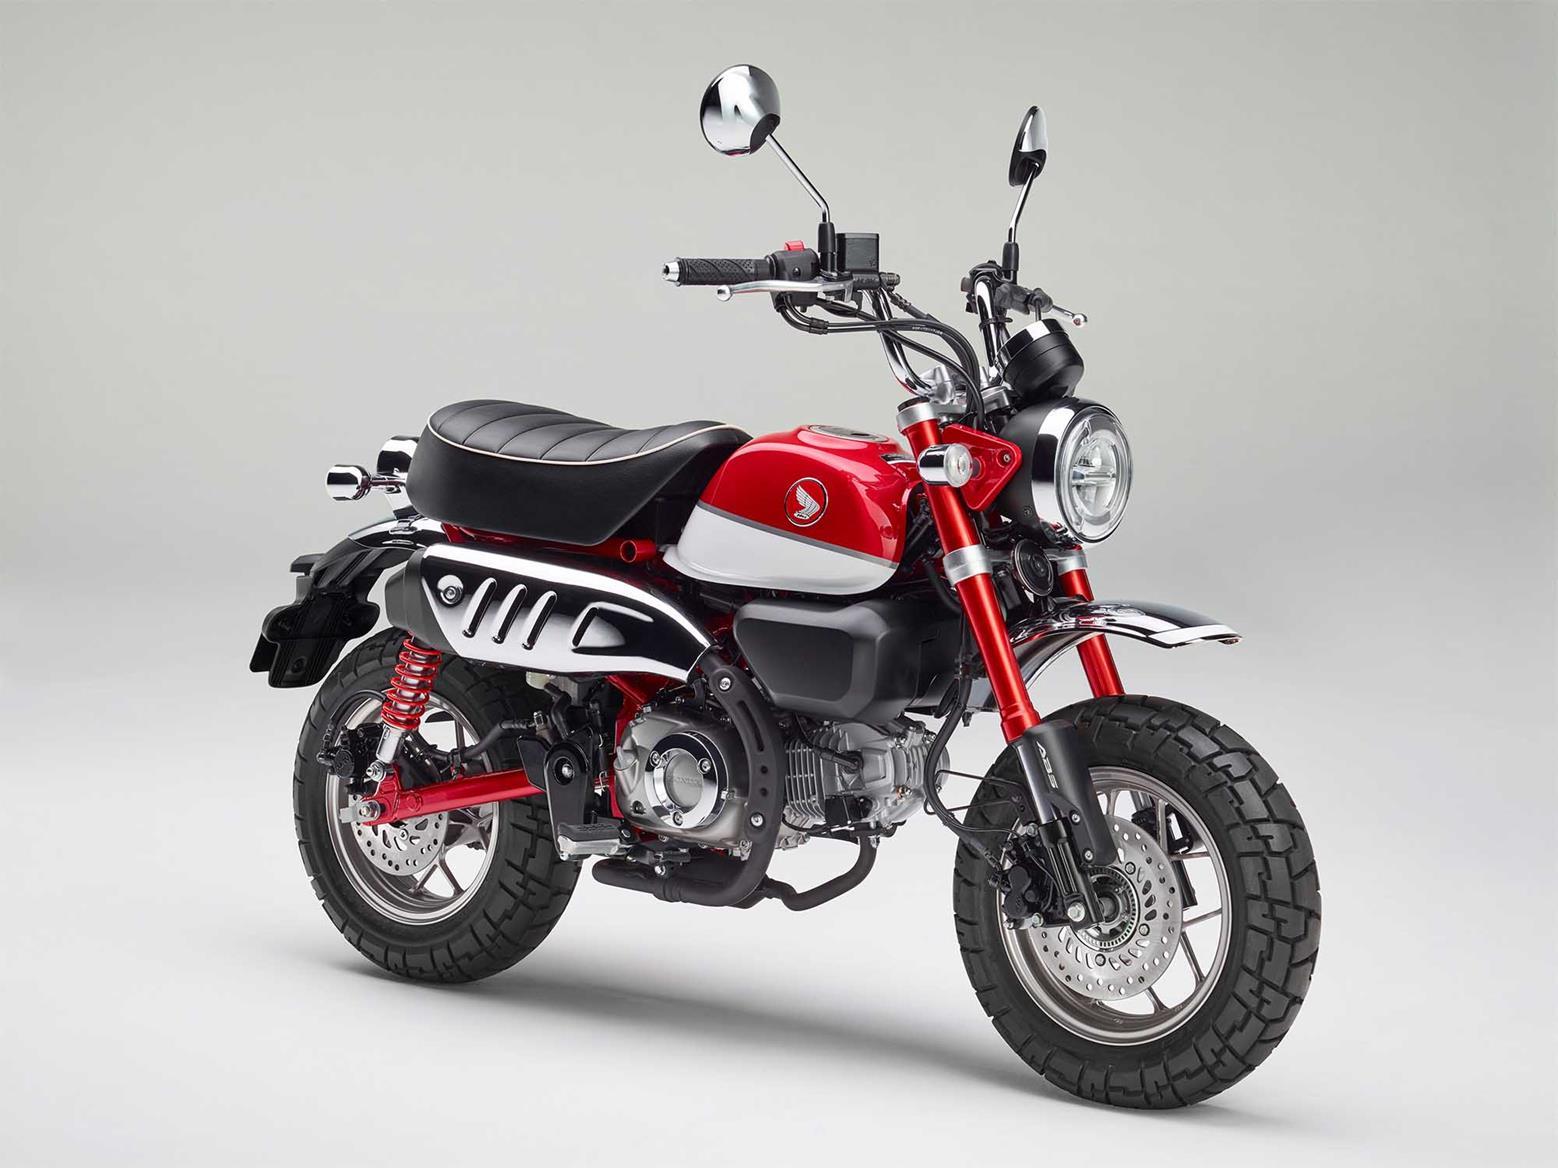 Honda Monkey bike in dealers by the end of July